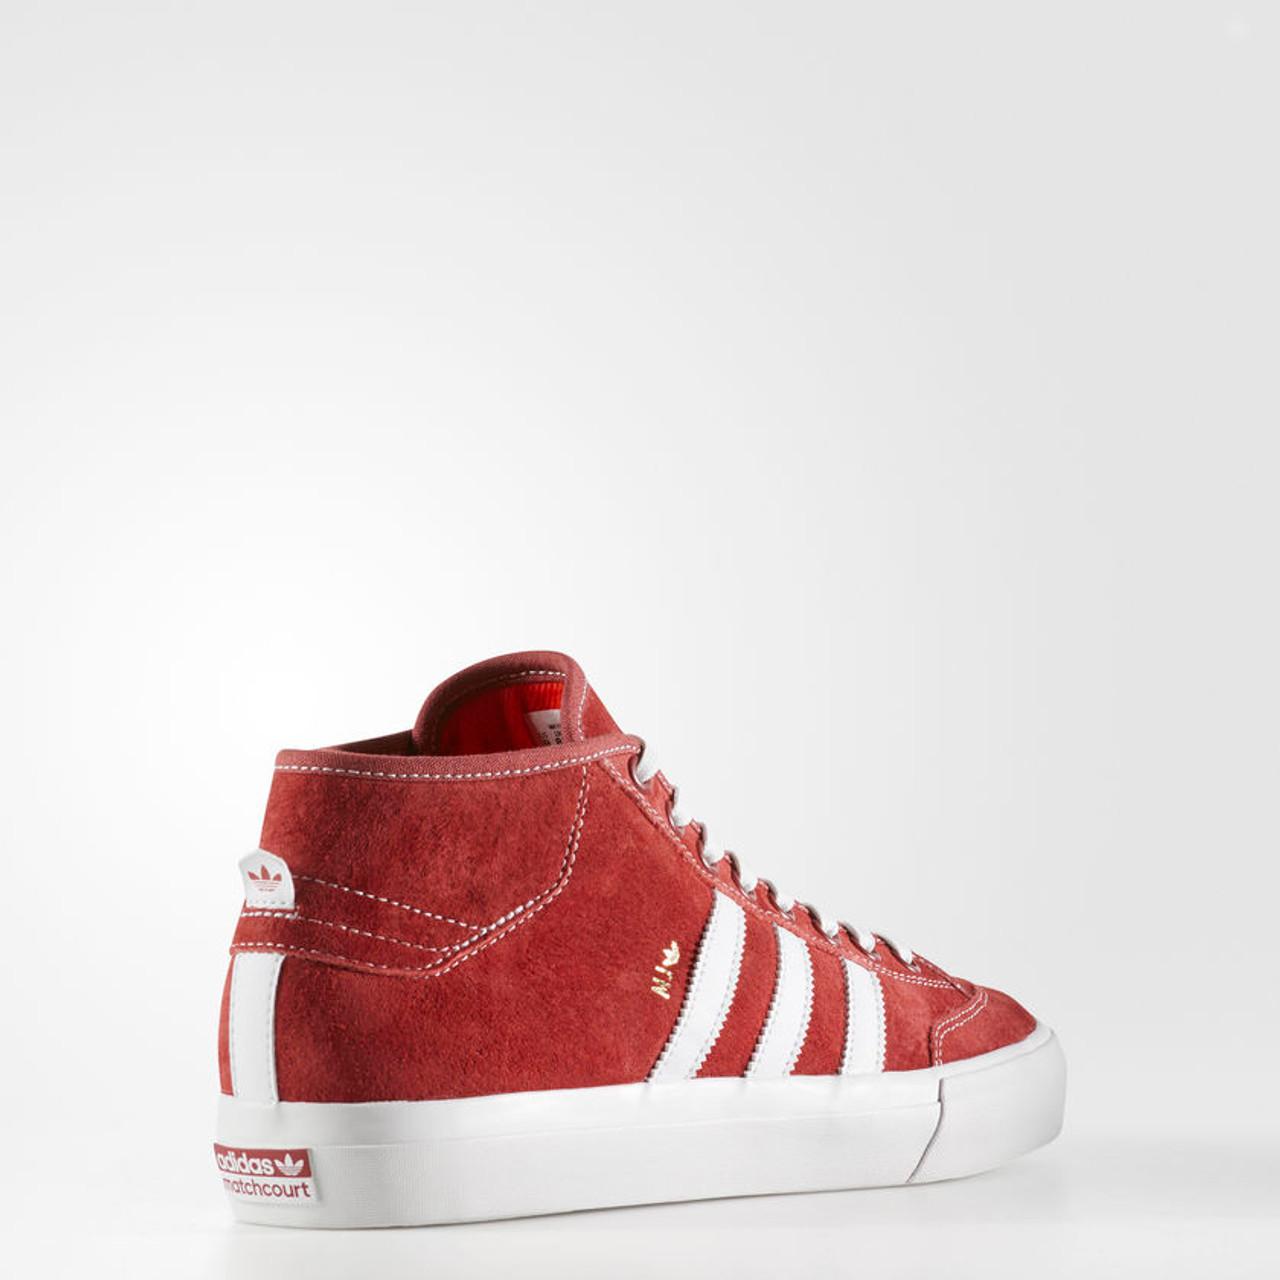 meet b0d61 dcd9a ... Adidas Matchcourt Mid Marc Johnson Shoes MJ Red White ...